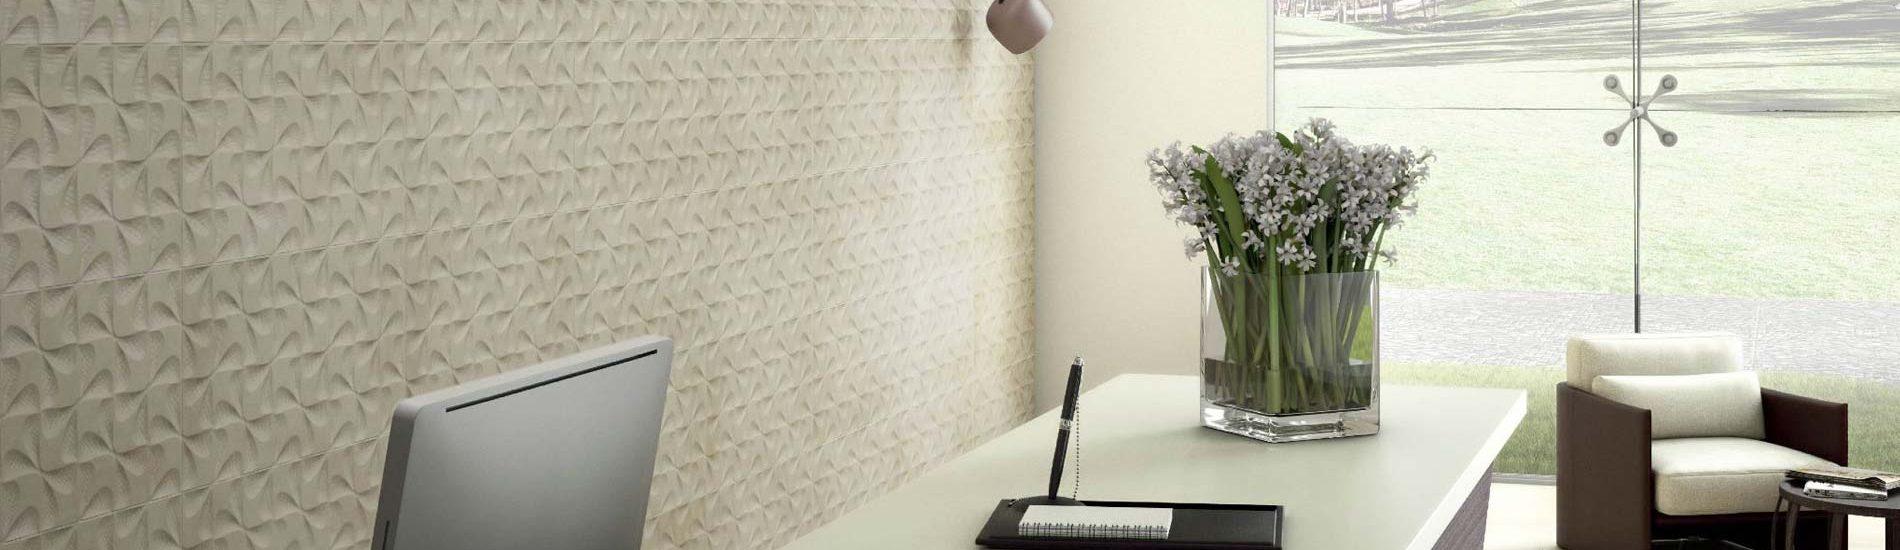 banner-lithos-floor-wall-tile-newker